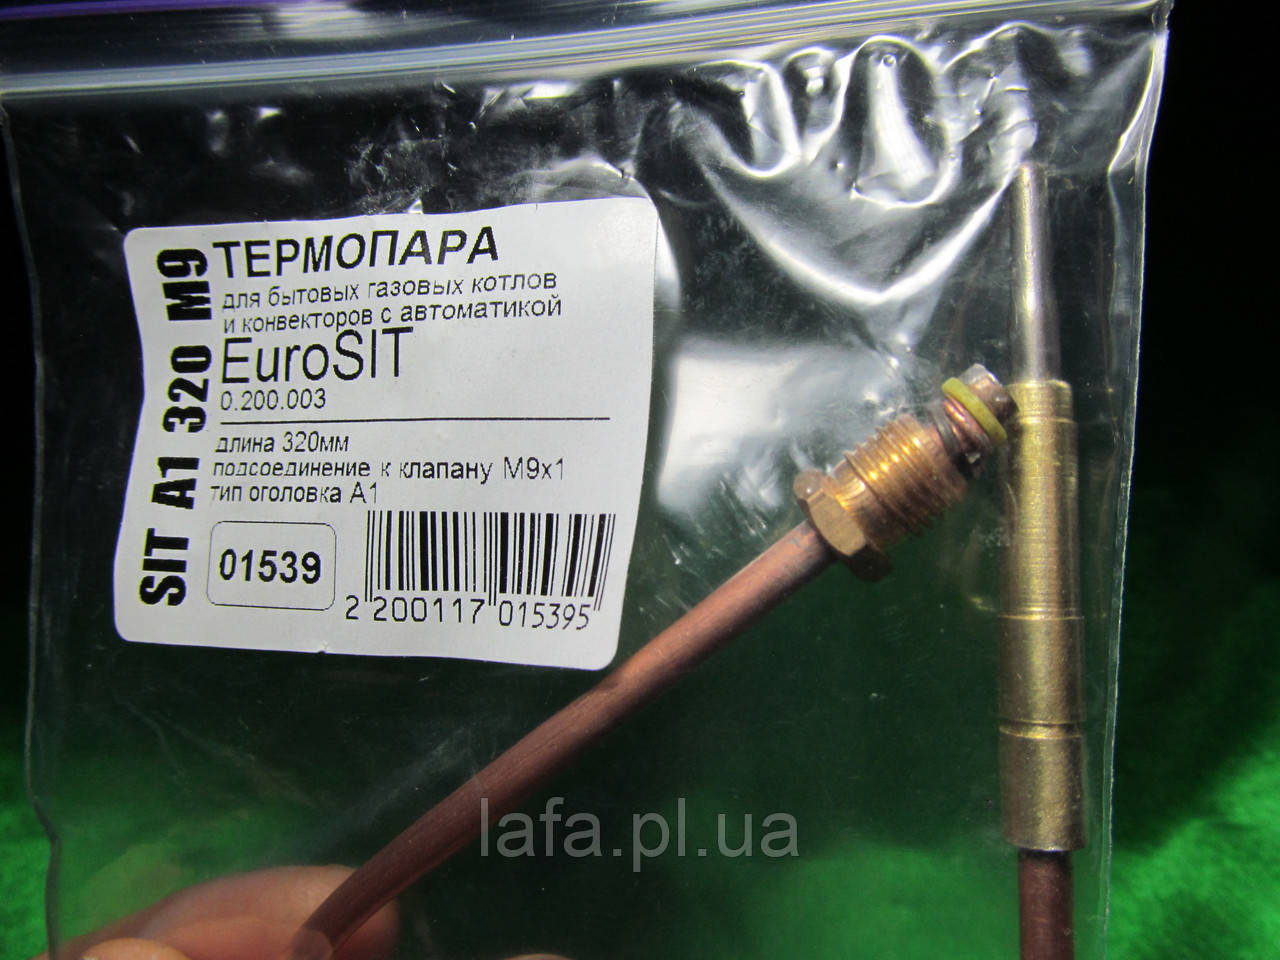 Термопара Eurosit A1 320mm M9 Евросит